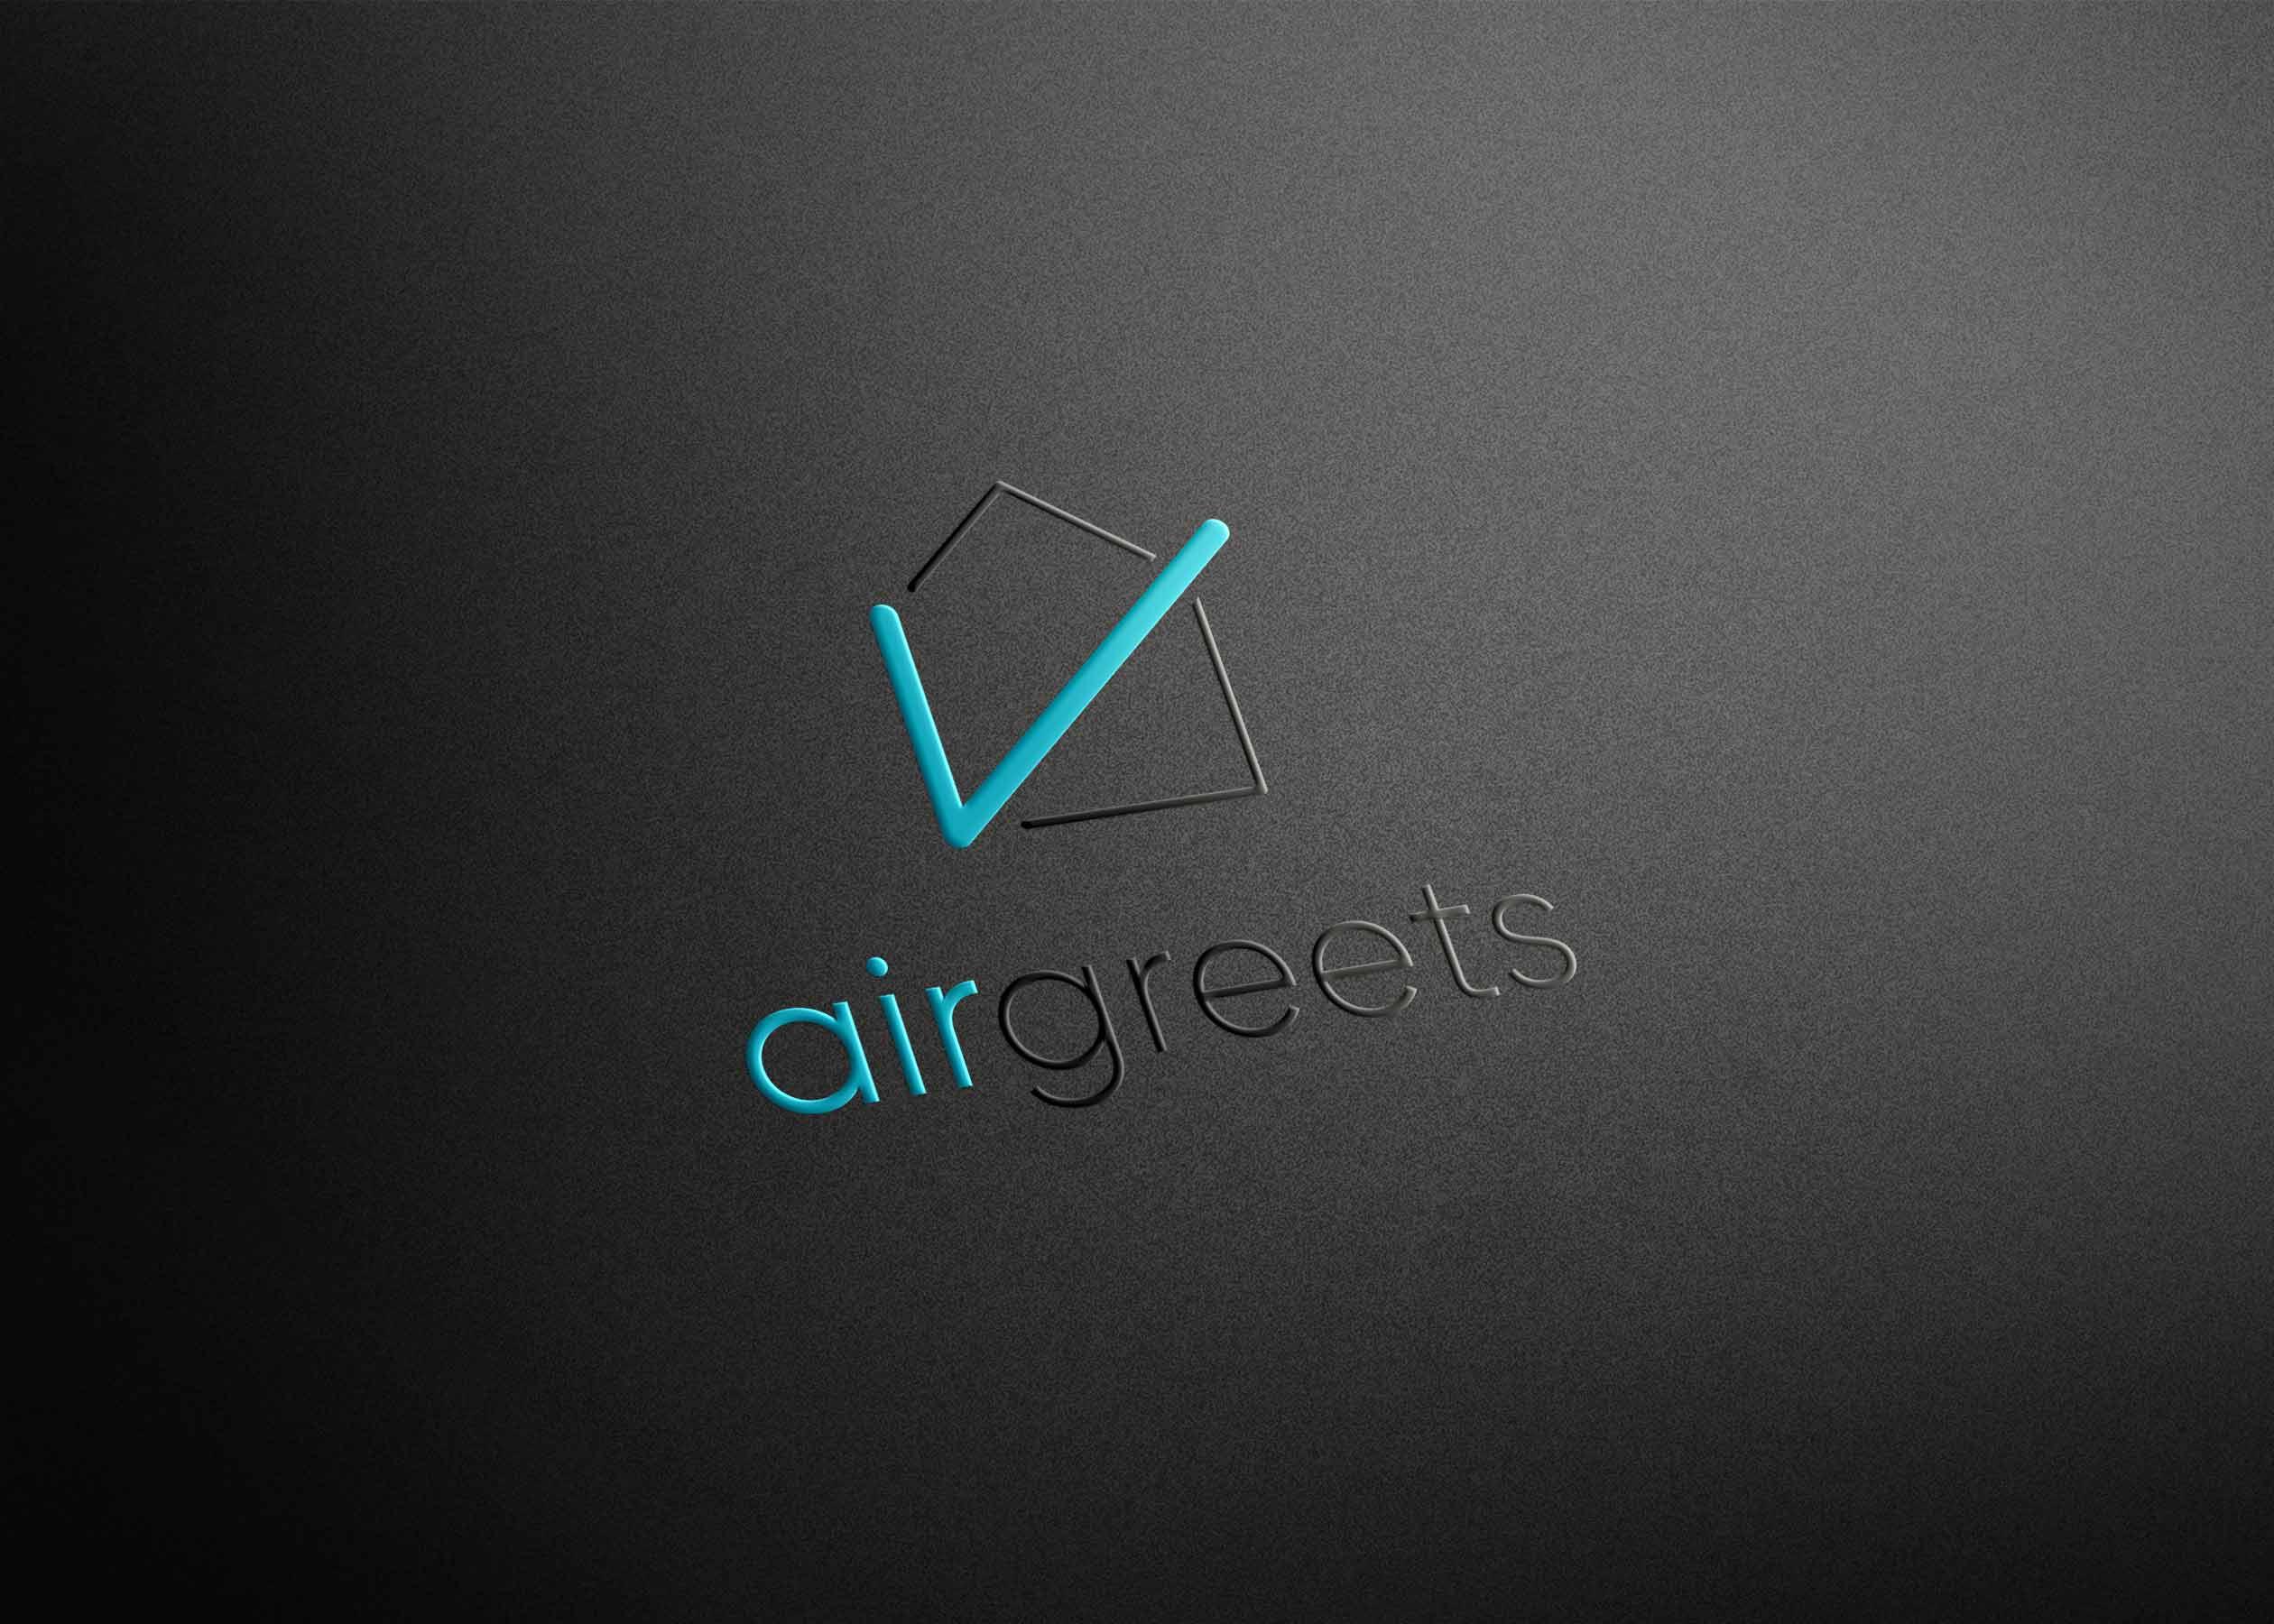 airgreets_logo-mockup_02